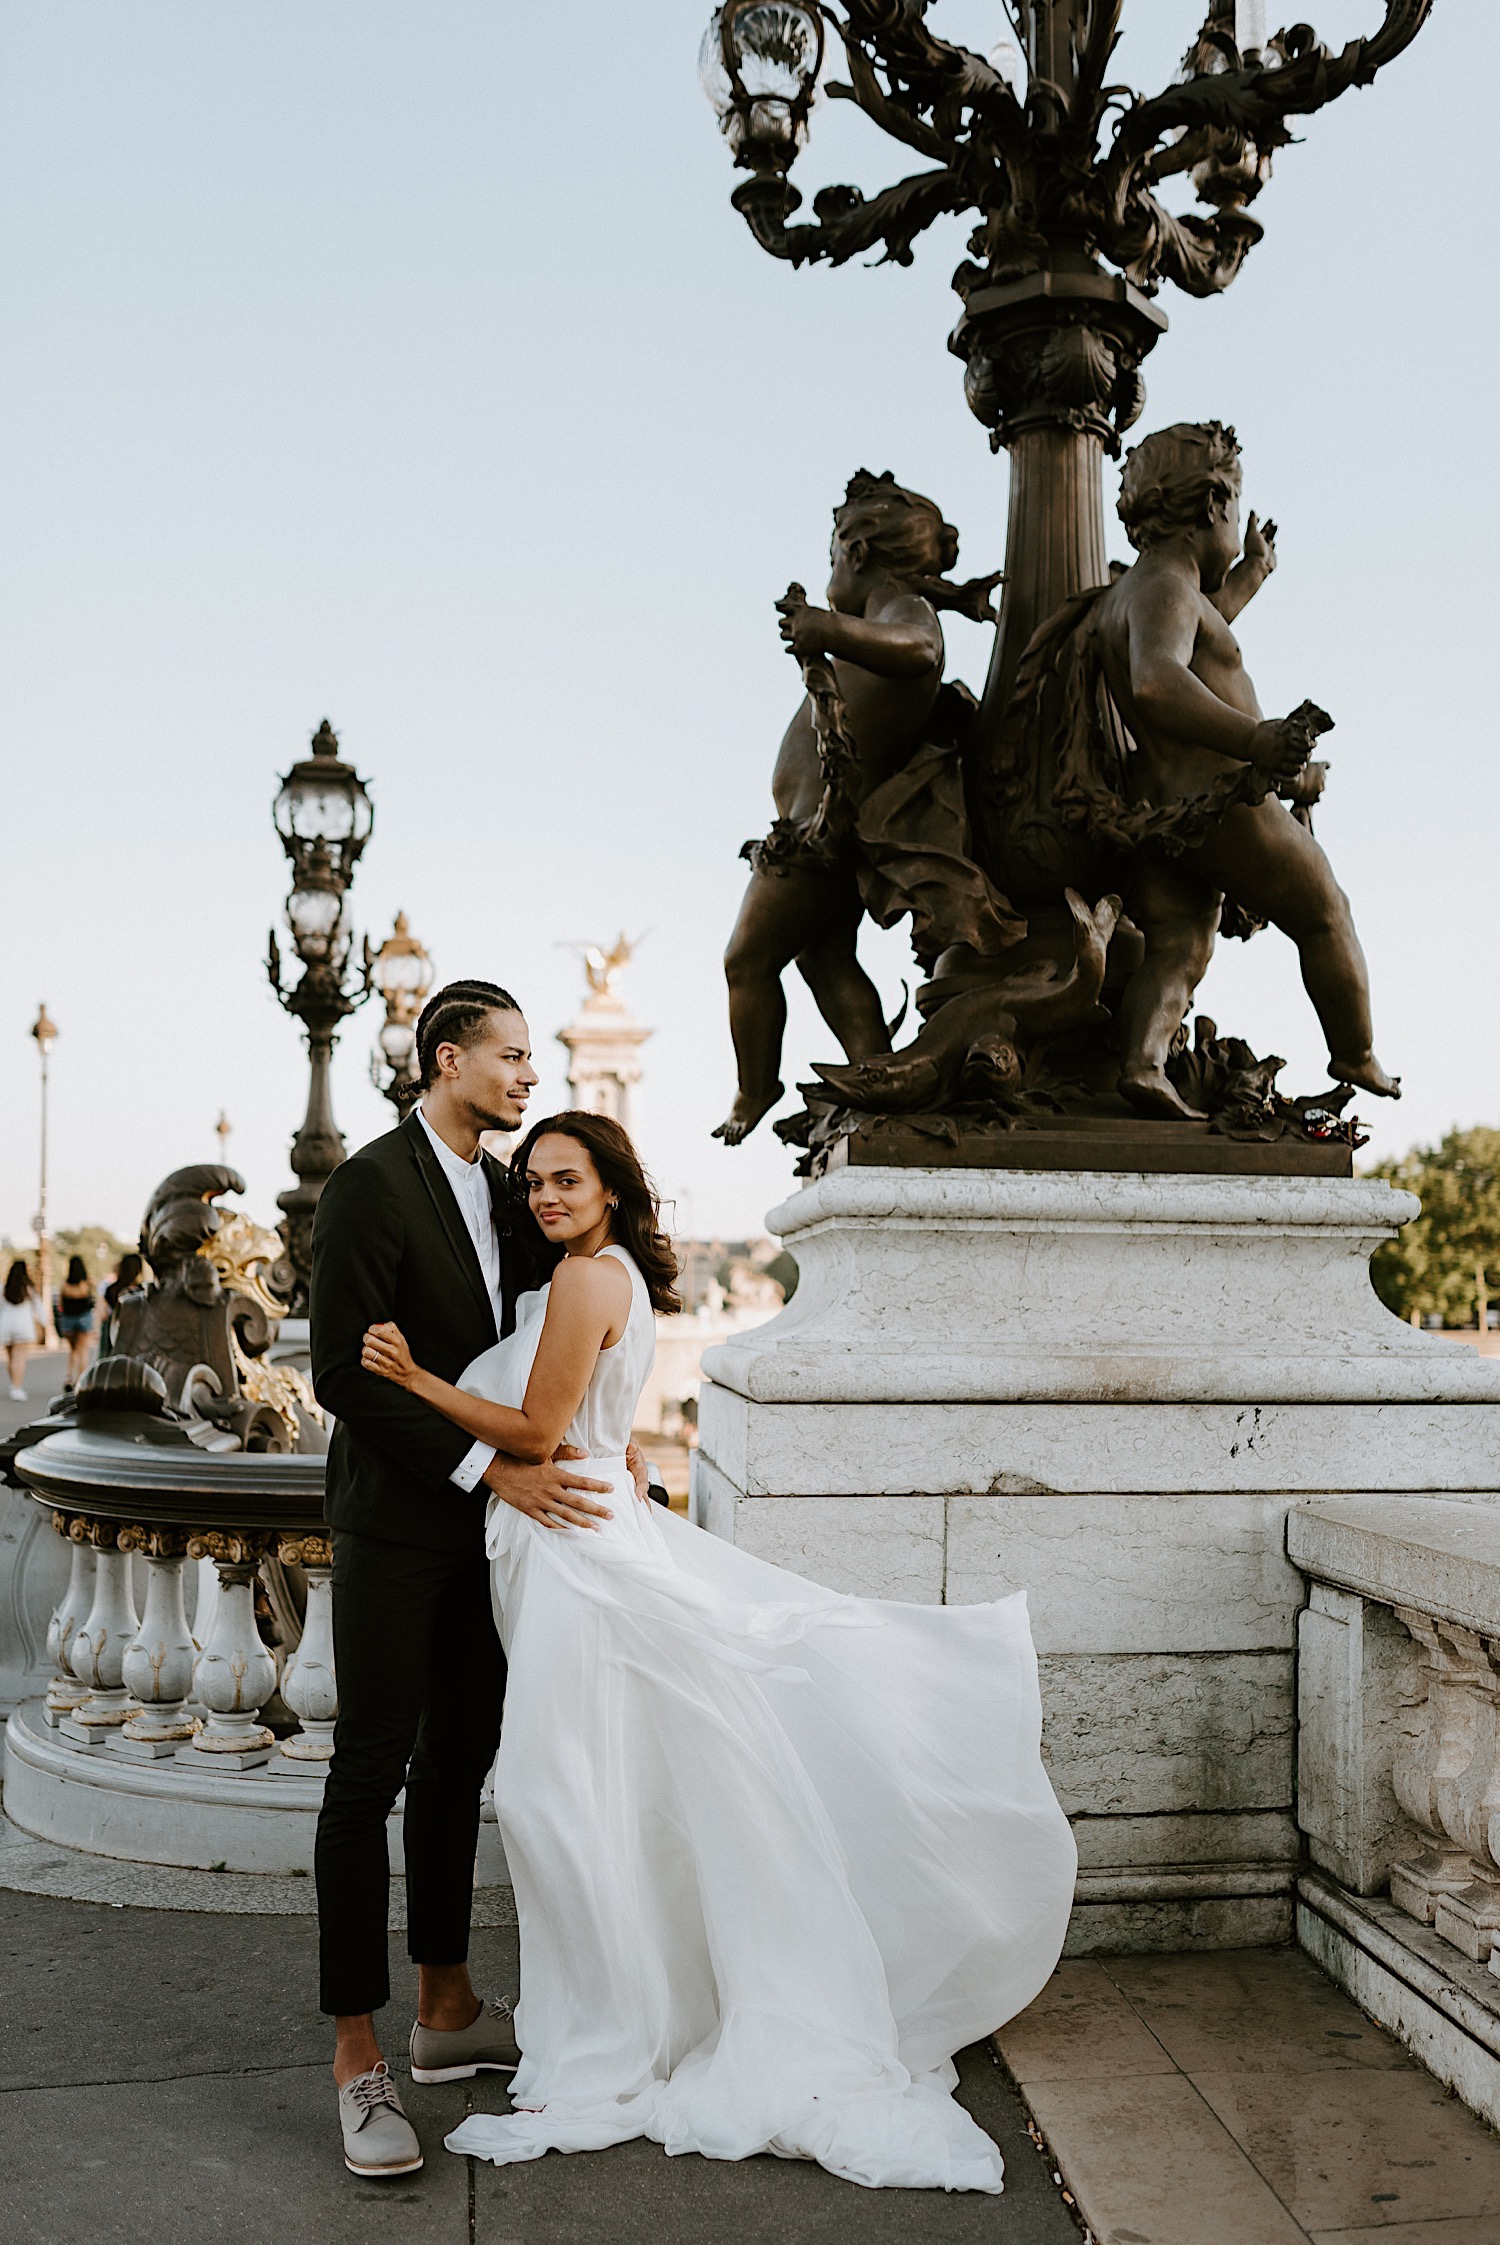 Paris Wedding Photos Paris Wedding Photographer Paris Photographe De Marriage Pont Alexandre Wedding Photos Anais Possamai Photography 25